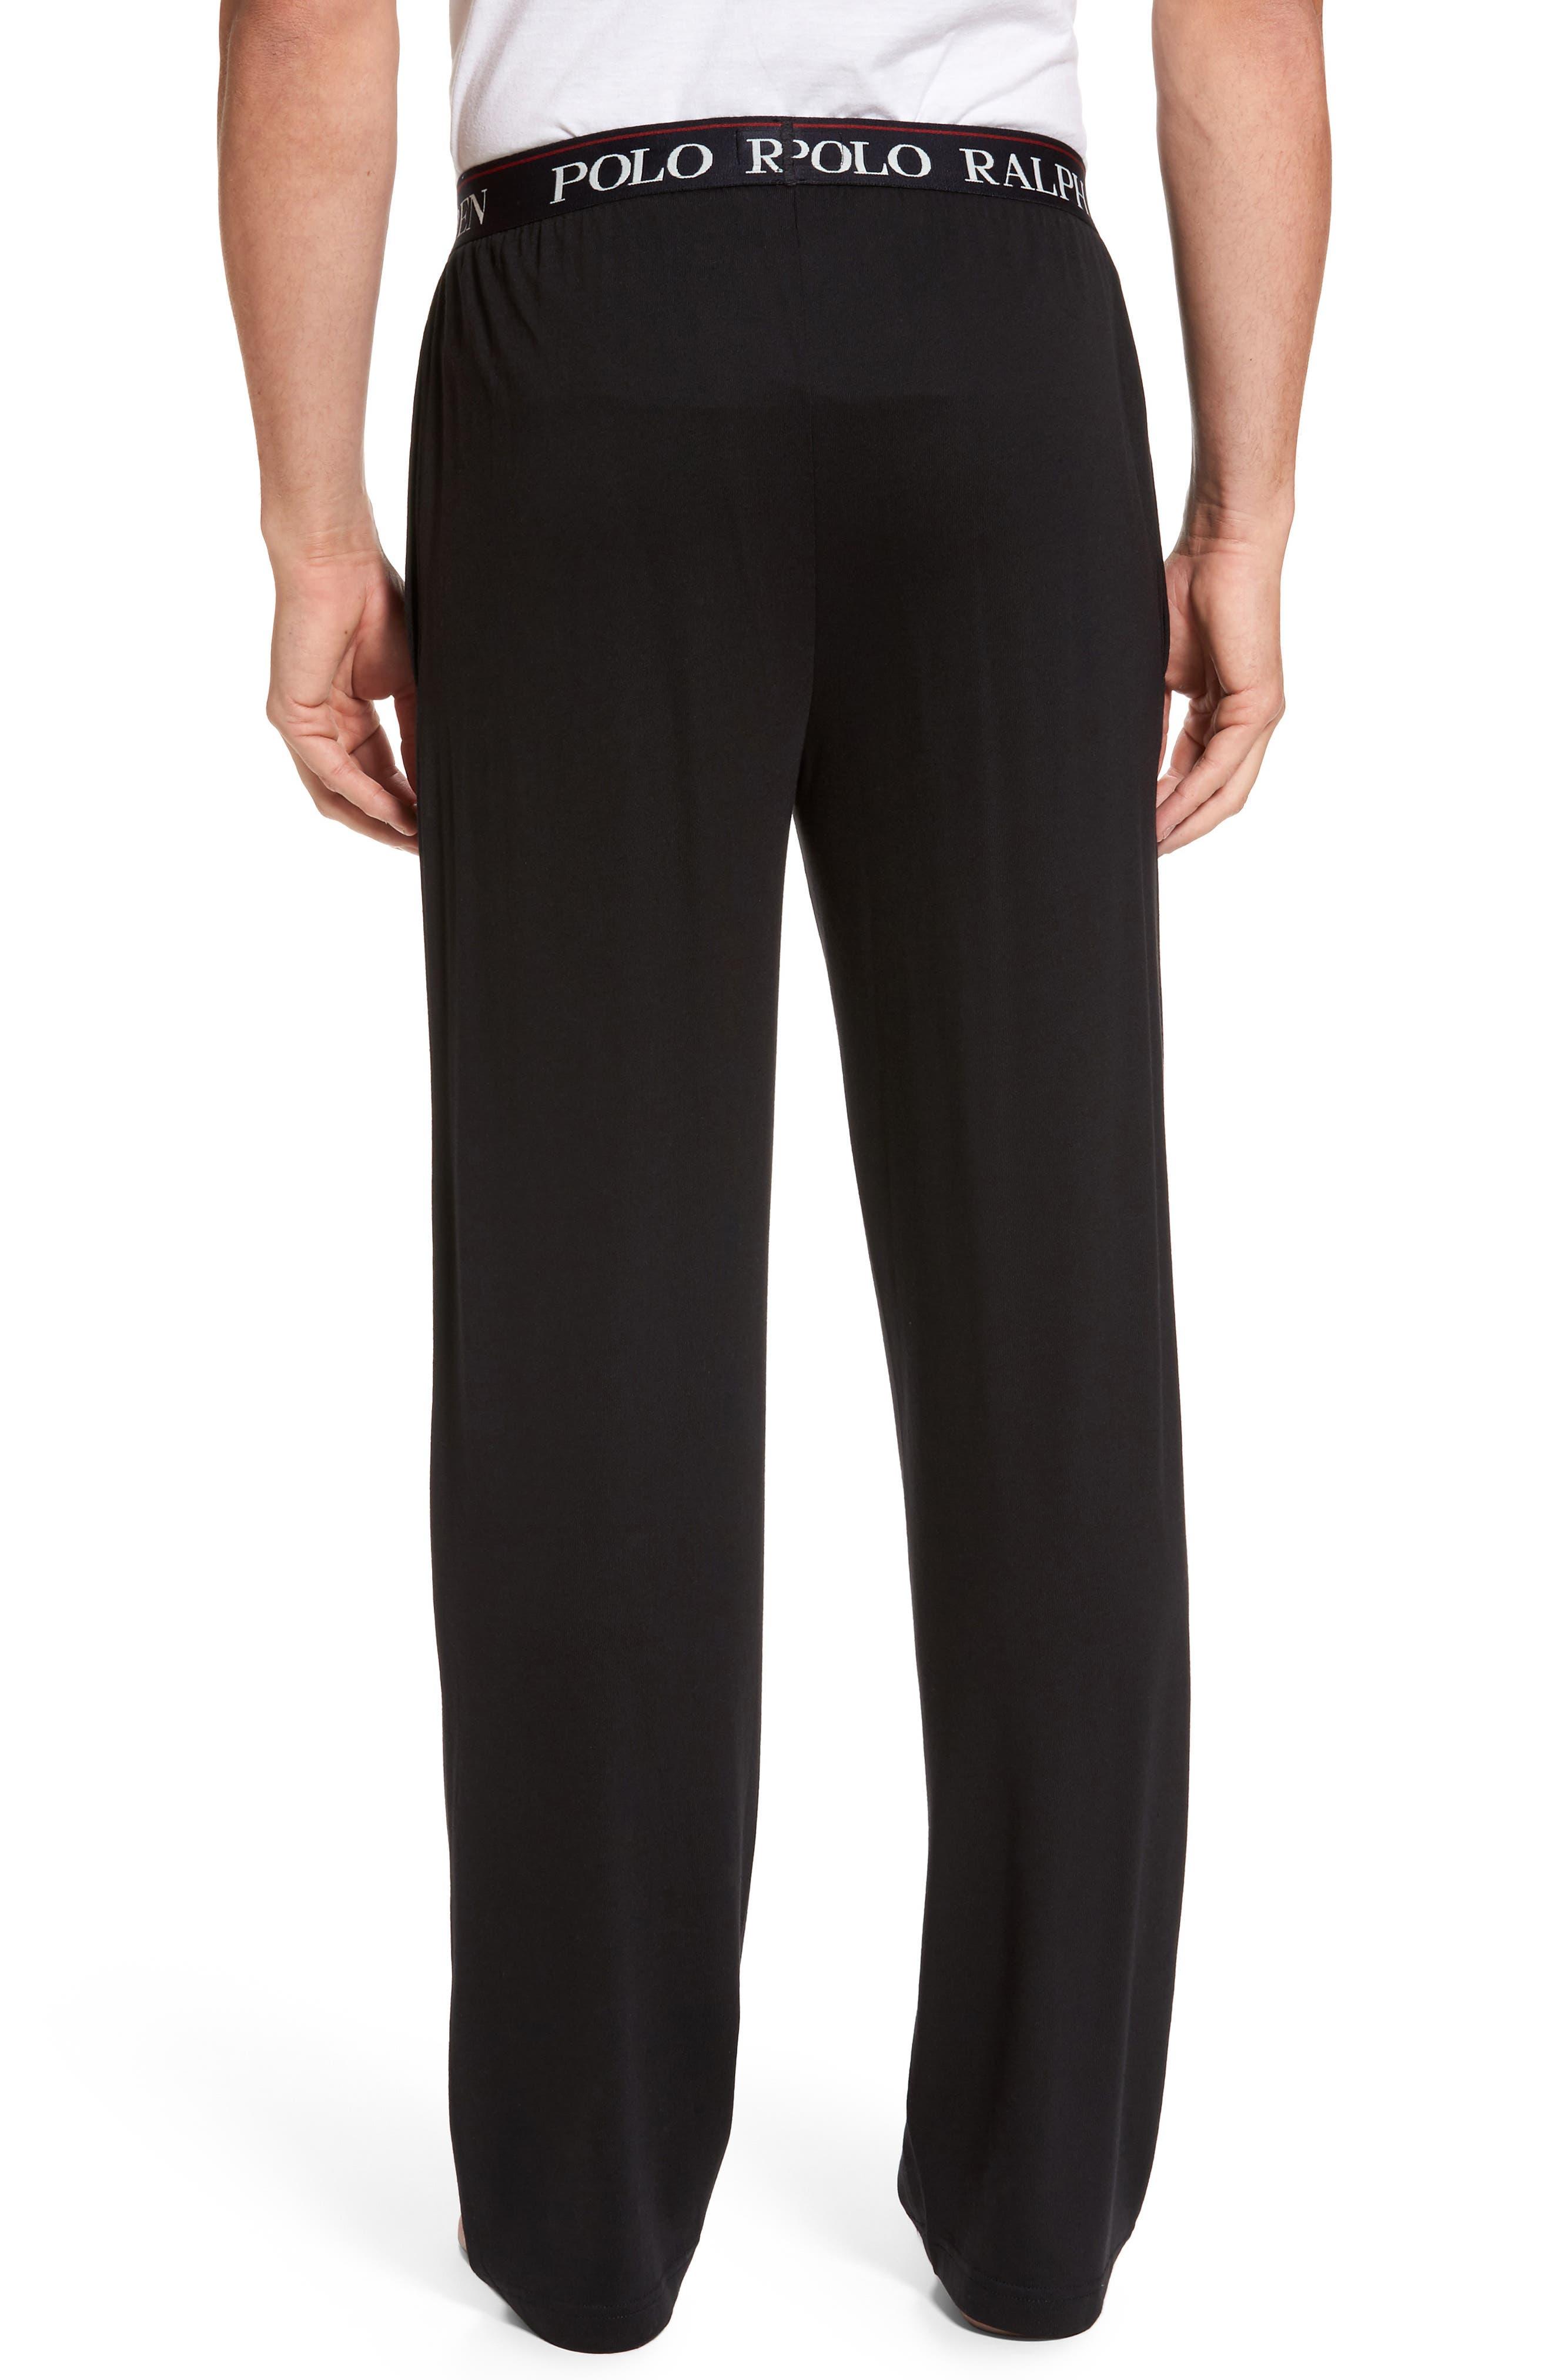 POLO RALPH LAUREN, Cotton & Modal Lounge Pants, Alternate thumbnail 2, color, POLO BLACK